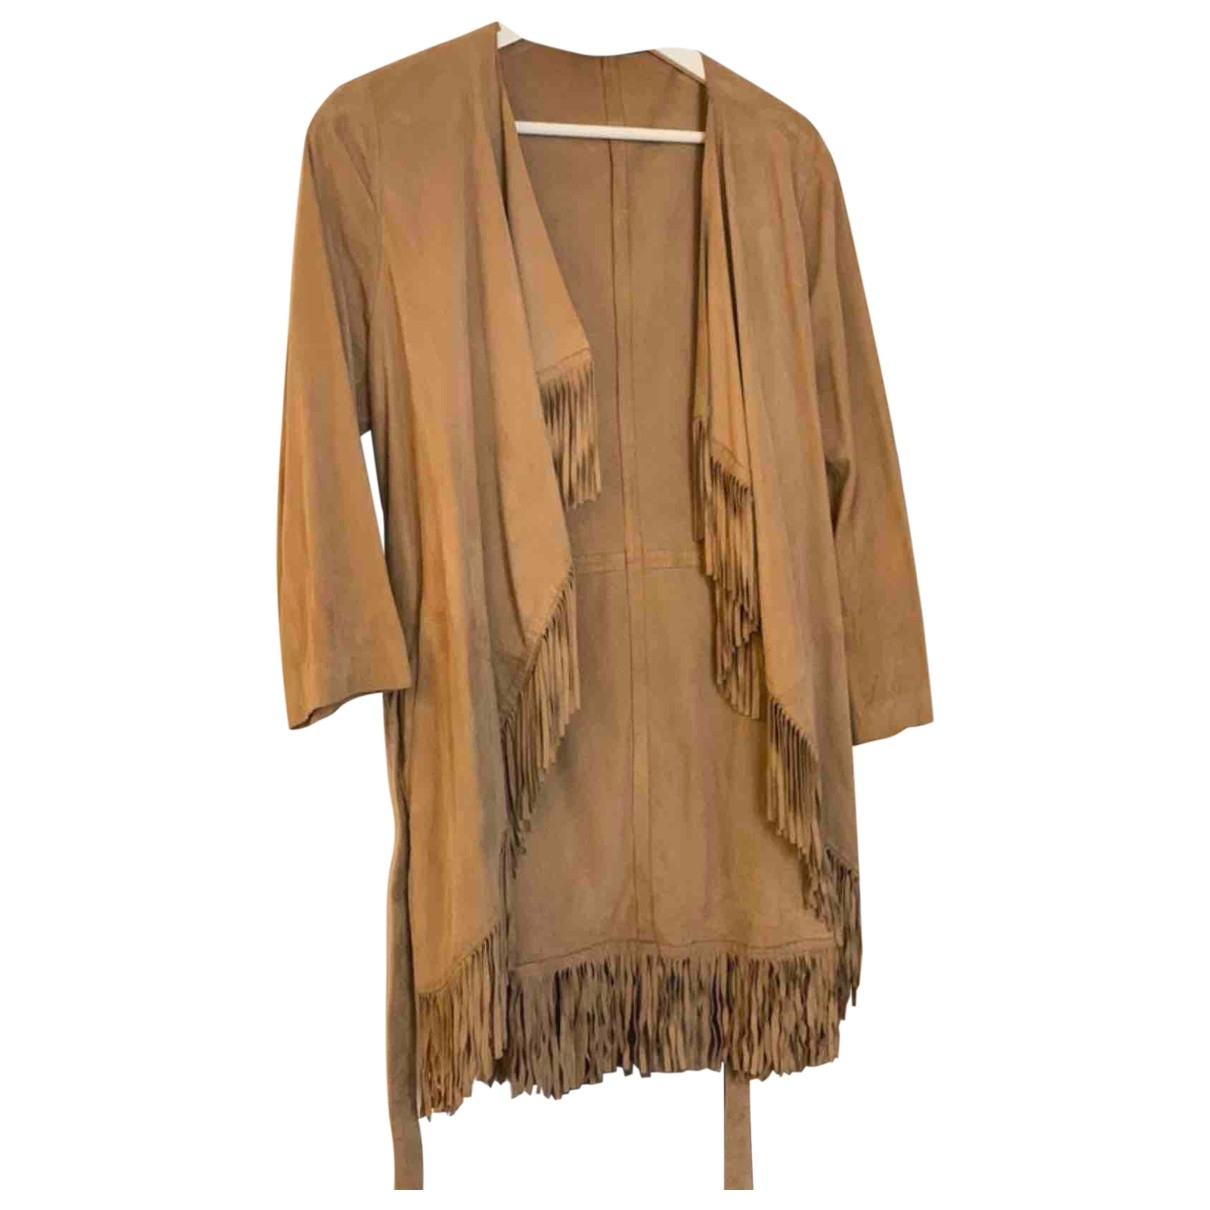 Uterque \N Camel Suede jacket for Women M International